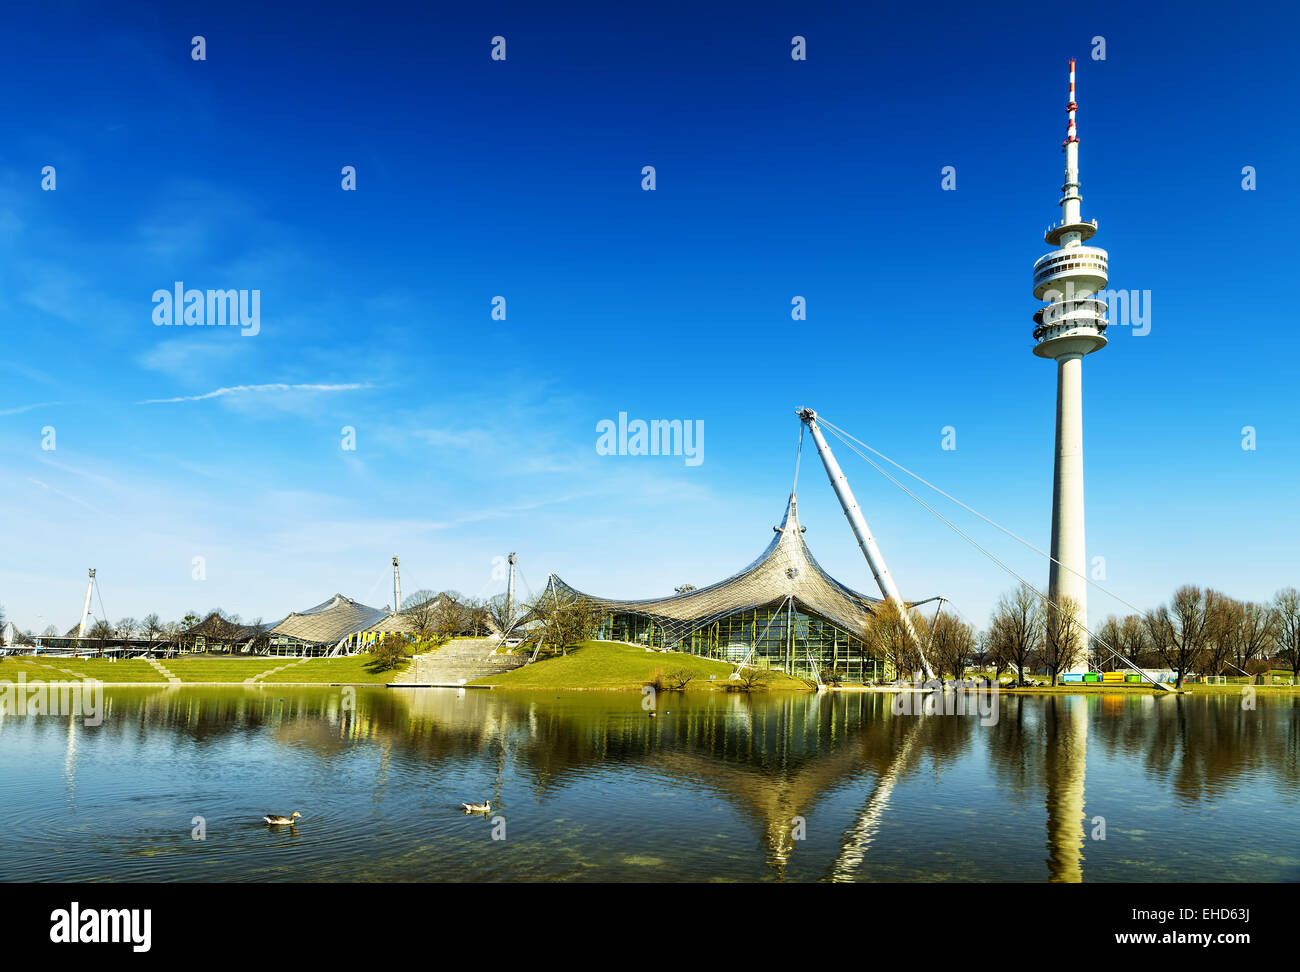 olympiapark, Munich Olympic Stadium and installation, Germany, Europe - Stock Image